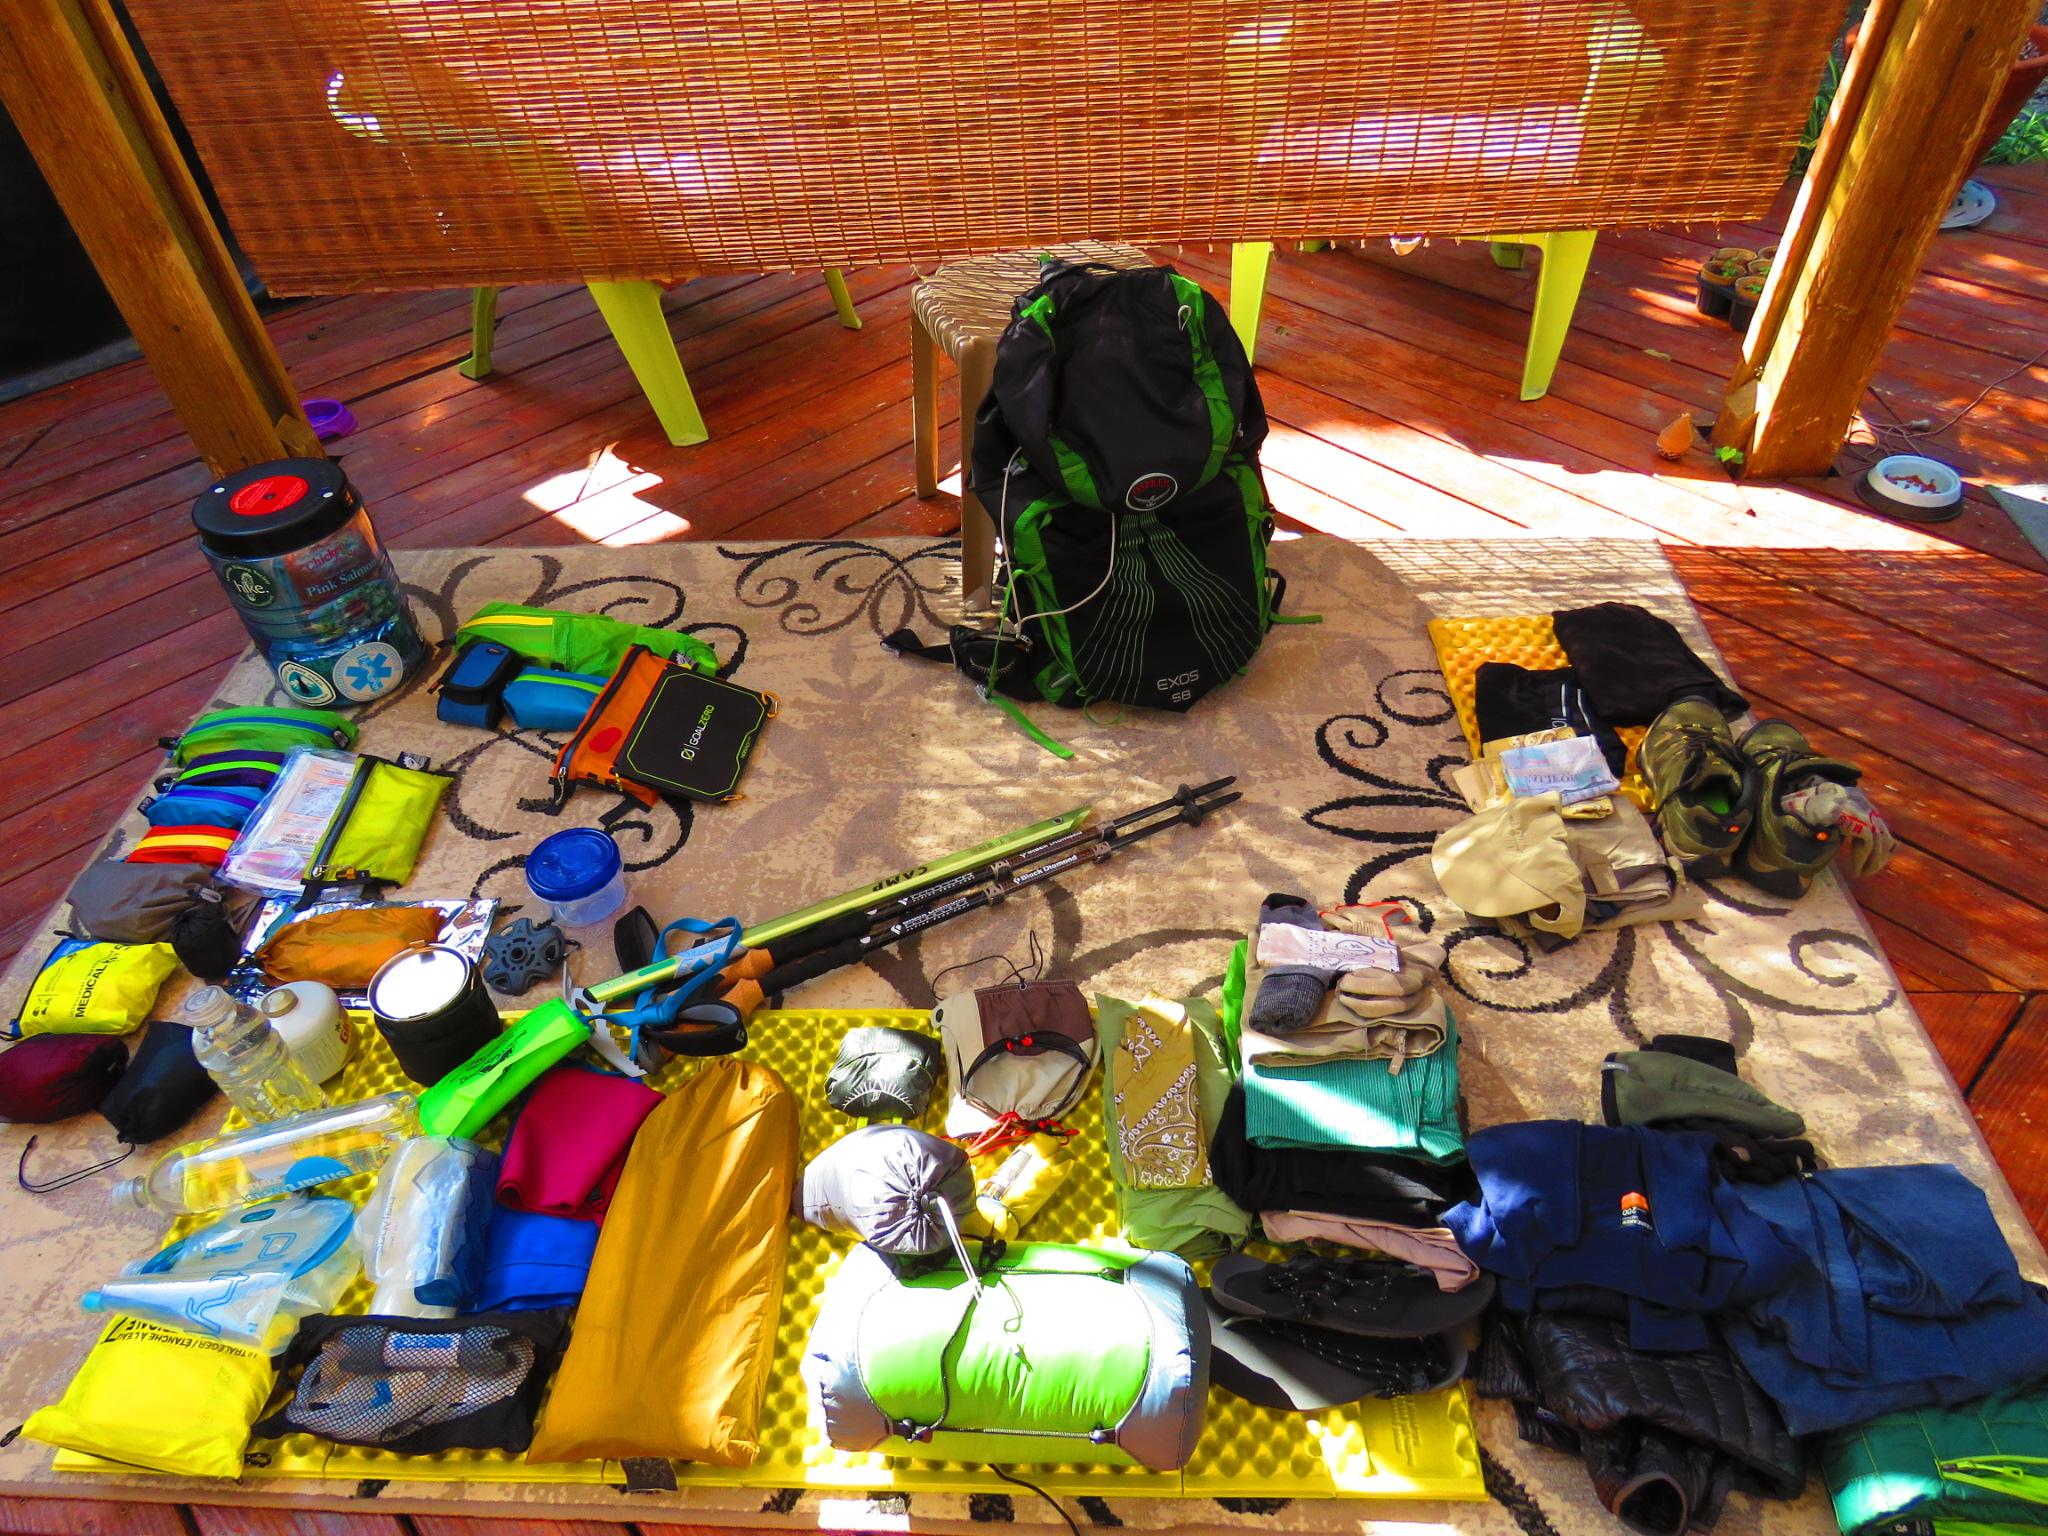 #LivethePCT, Jordan Summers, Pacific Crest Trail guide, Wilderness Press, thru-hiking, best bevy spot PCT